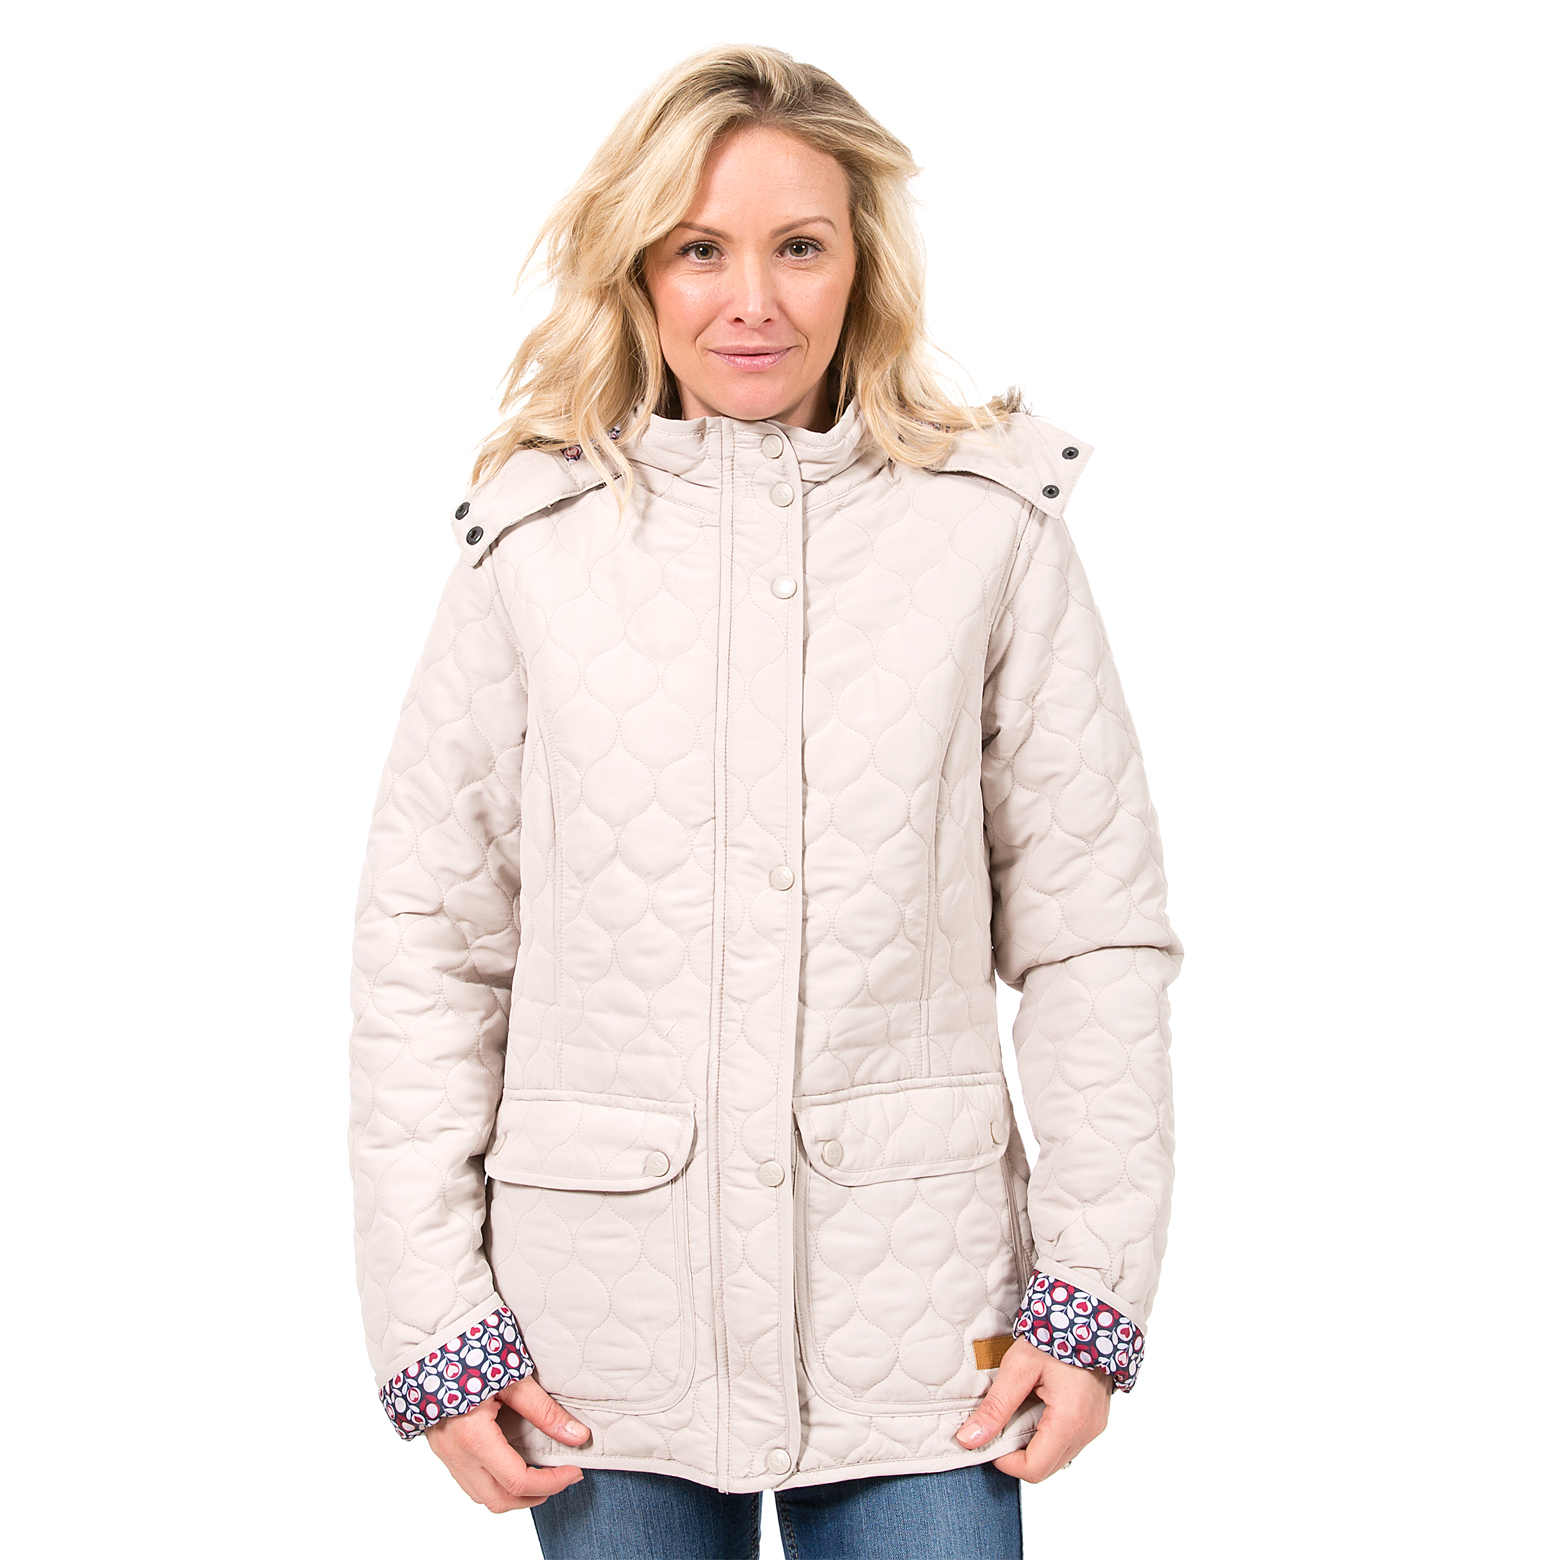 7873fc48efb56 Jenna Women s Casual Parka Jacket